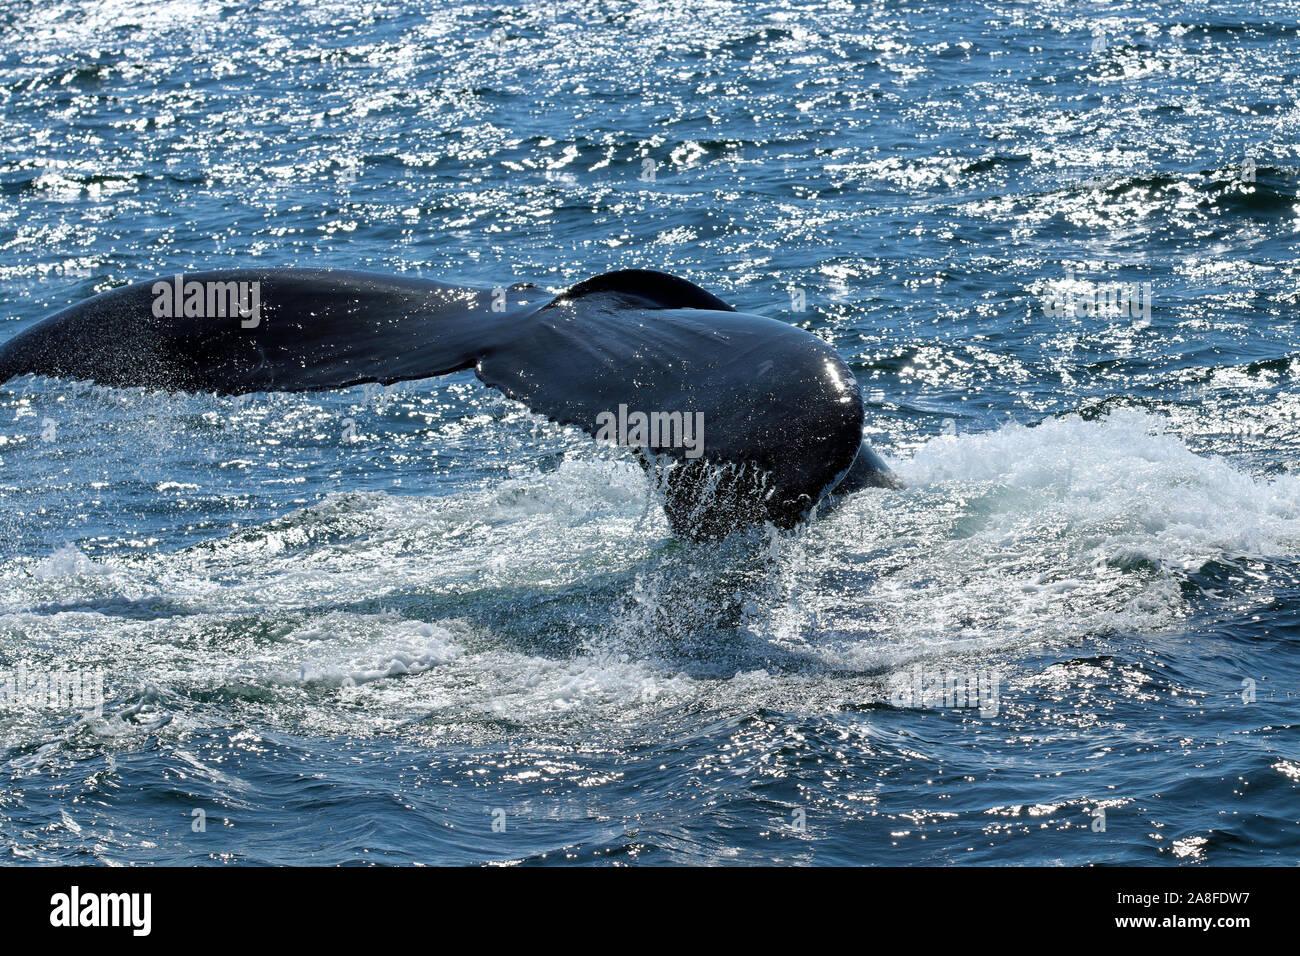 Close-up of fluke of humpback whale (Megaptera novaeangliae) in a dive at Stellwagen Bank National Marine Sanctuary off the Massachusetts coast Stock Photo